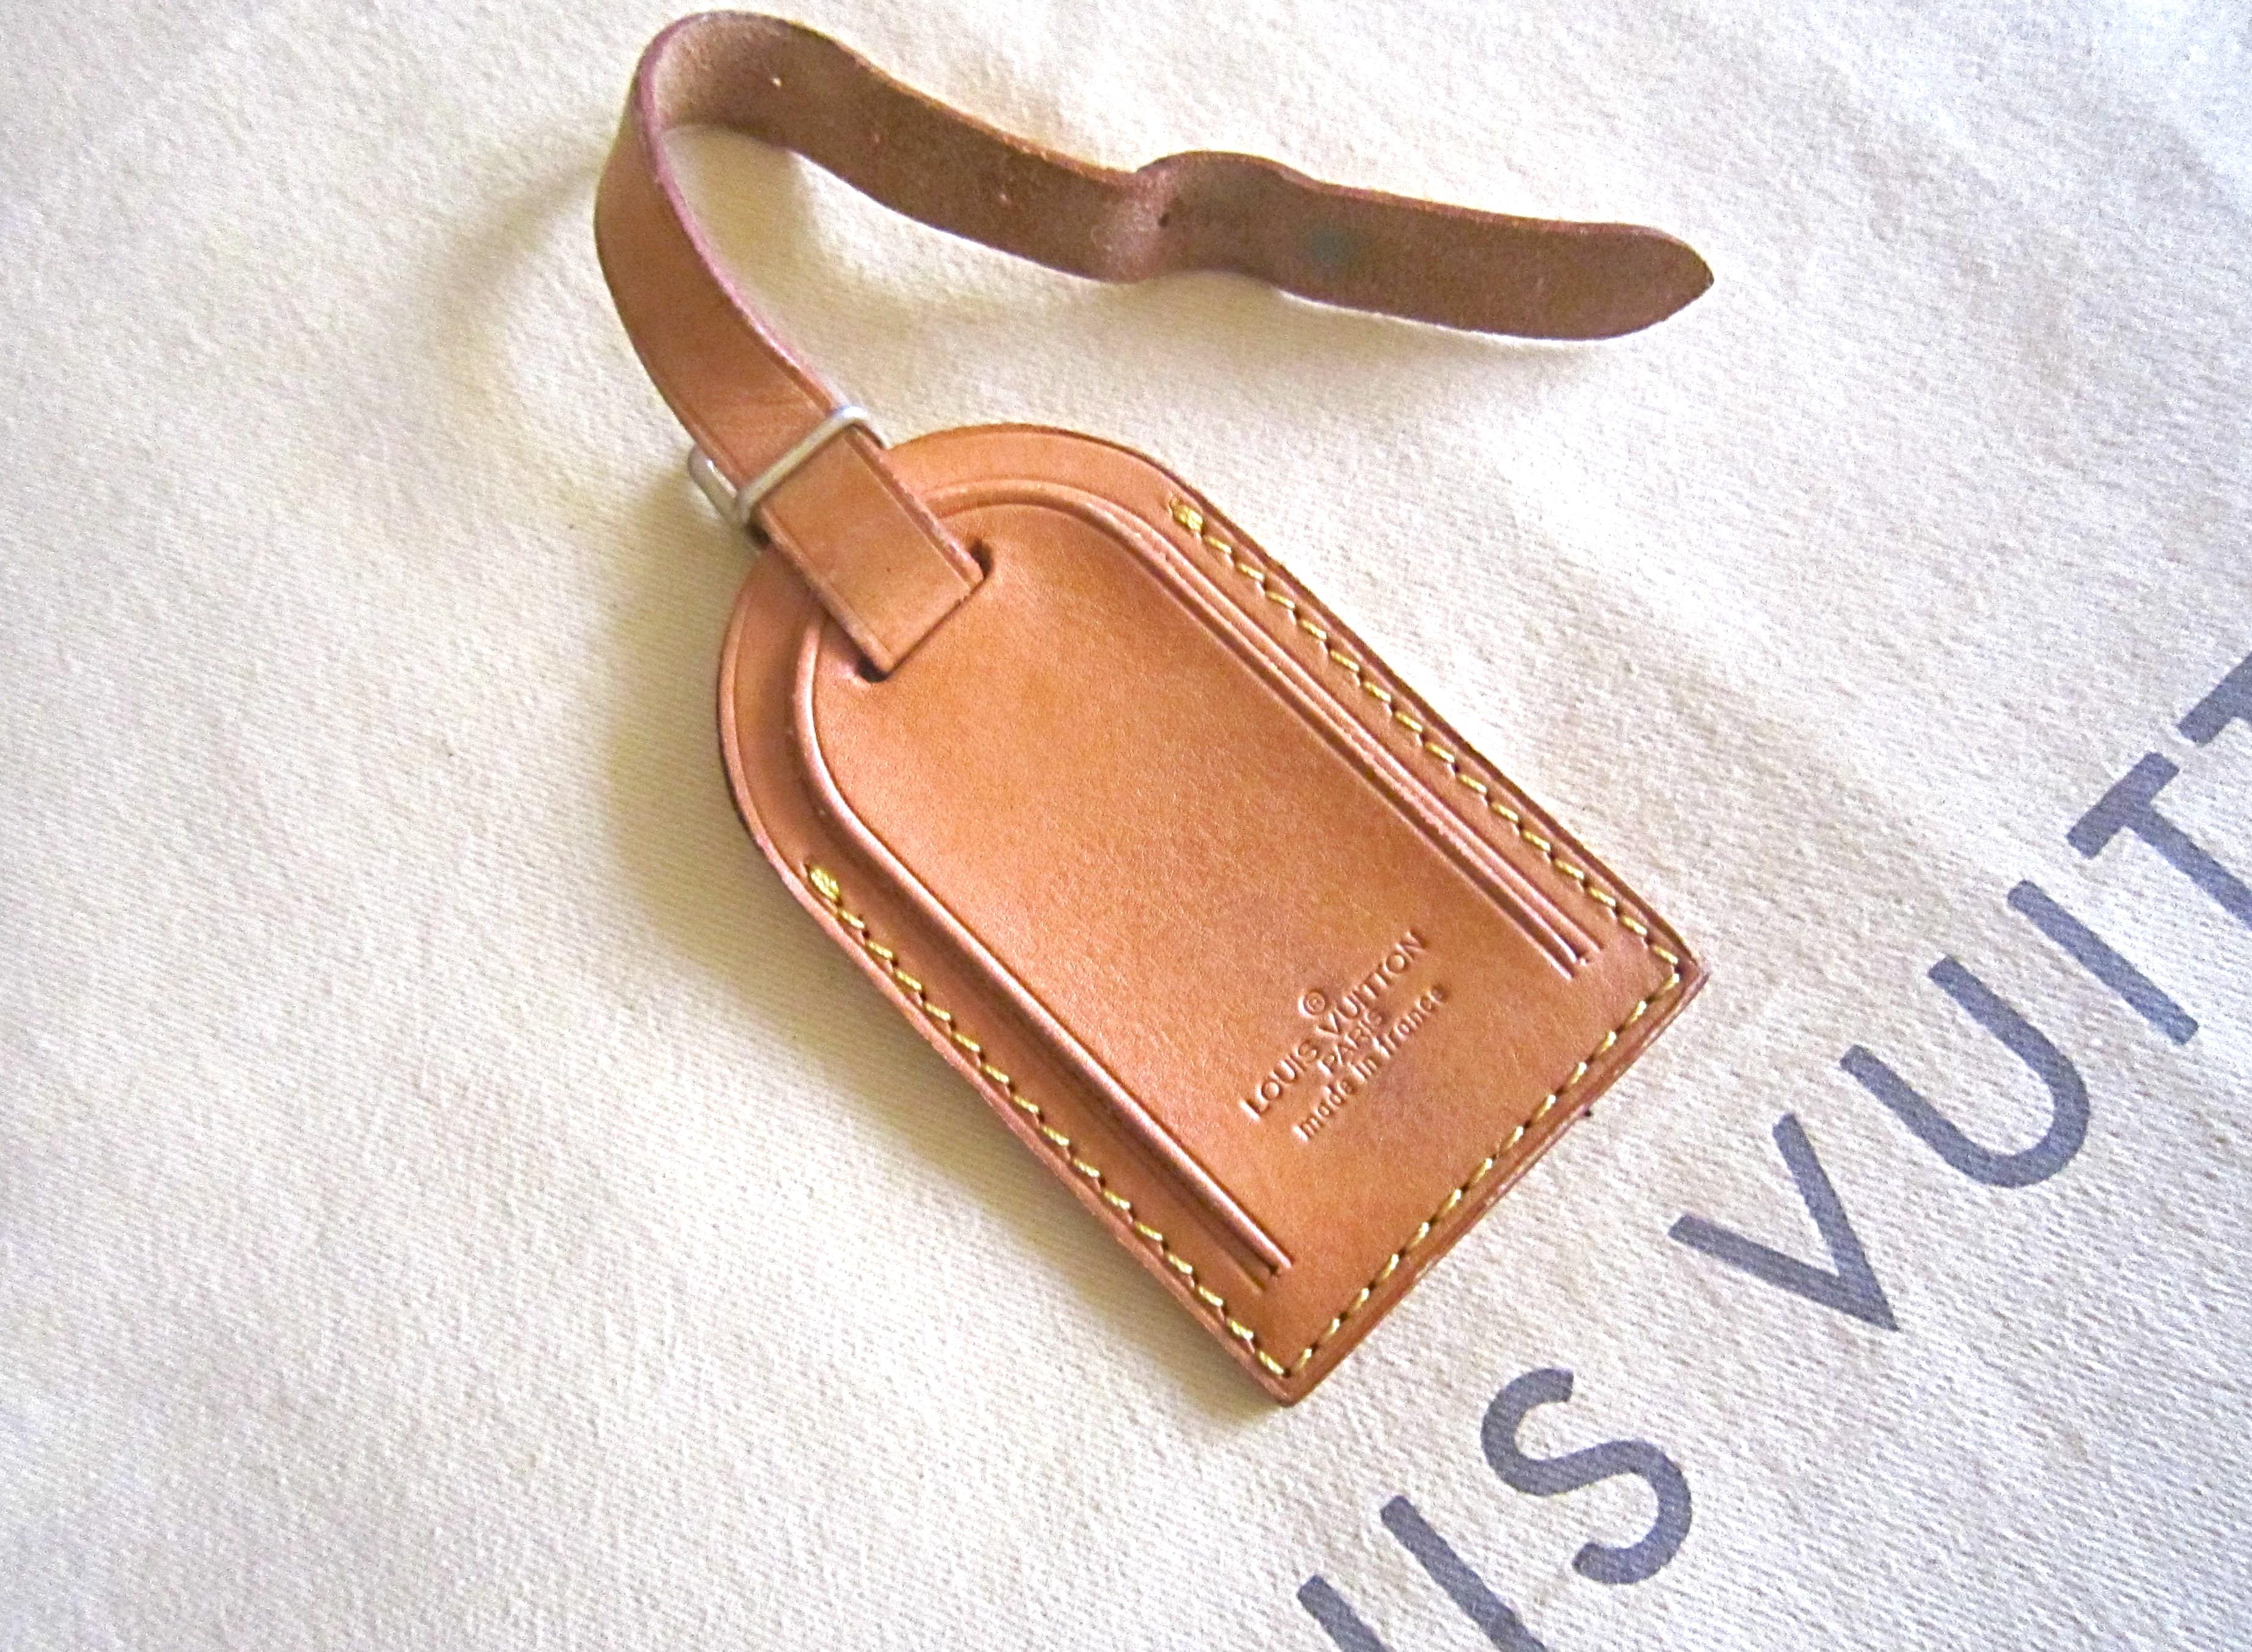 8825a246ee09 Louis Vuitton Cardholder Name Tag - Luxurylana Boutique